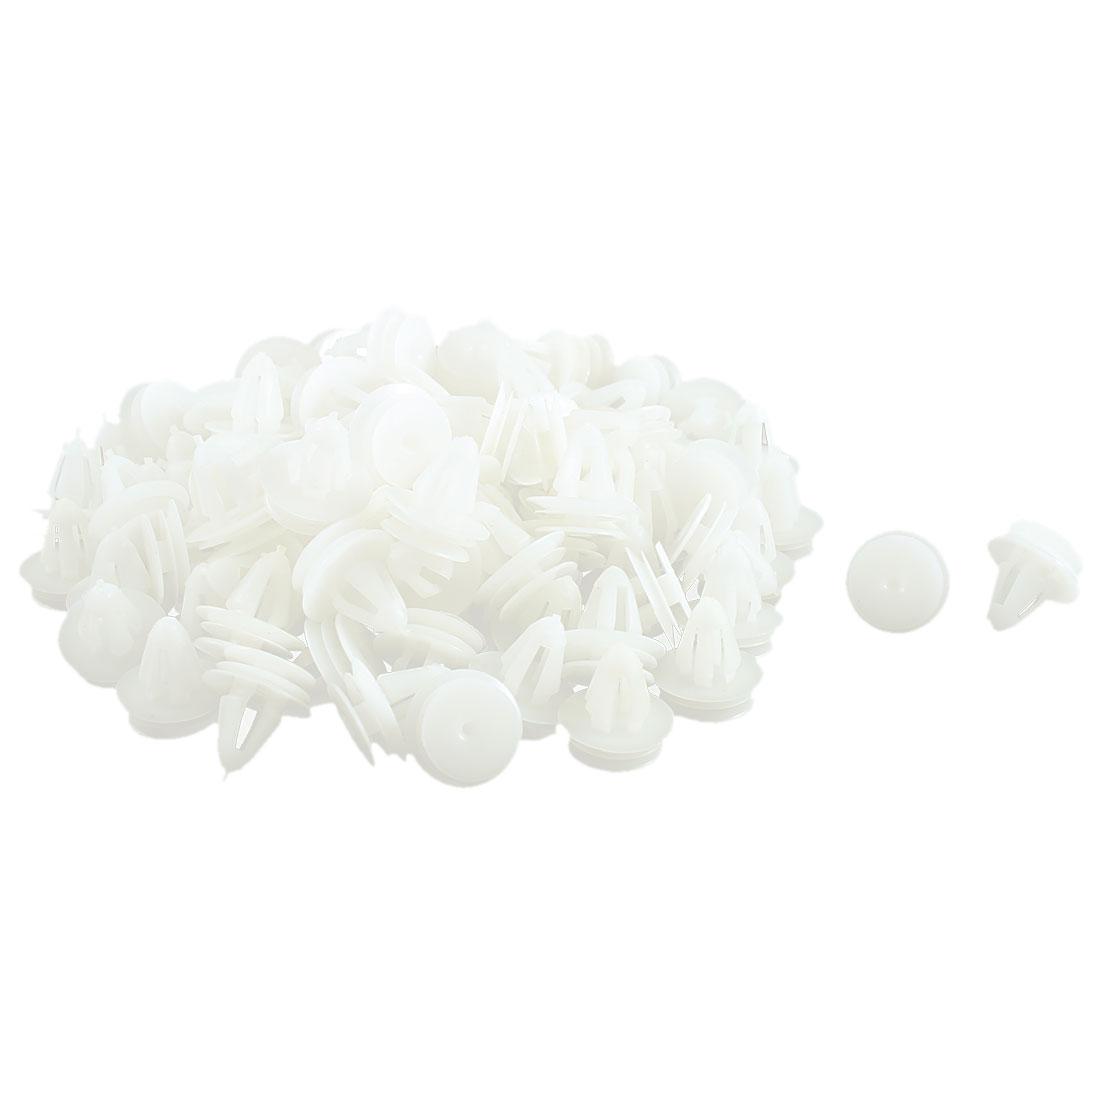 100 Pcs White Plastic Rivet Trim Fastener Retainer Clips 8.5mm Hole Dia